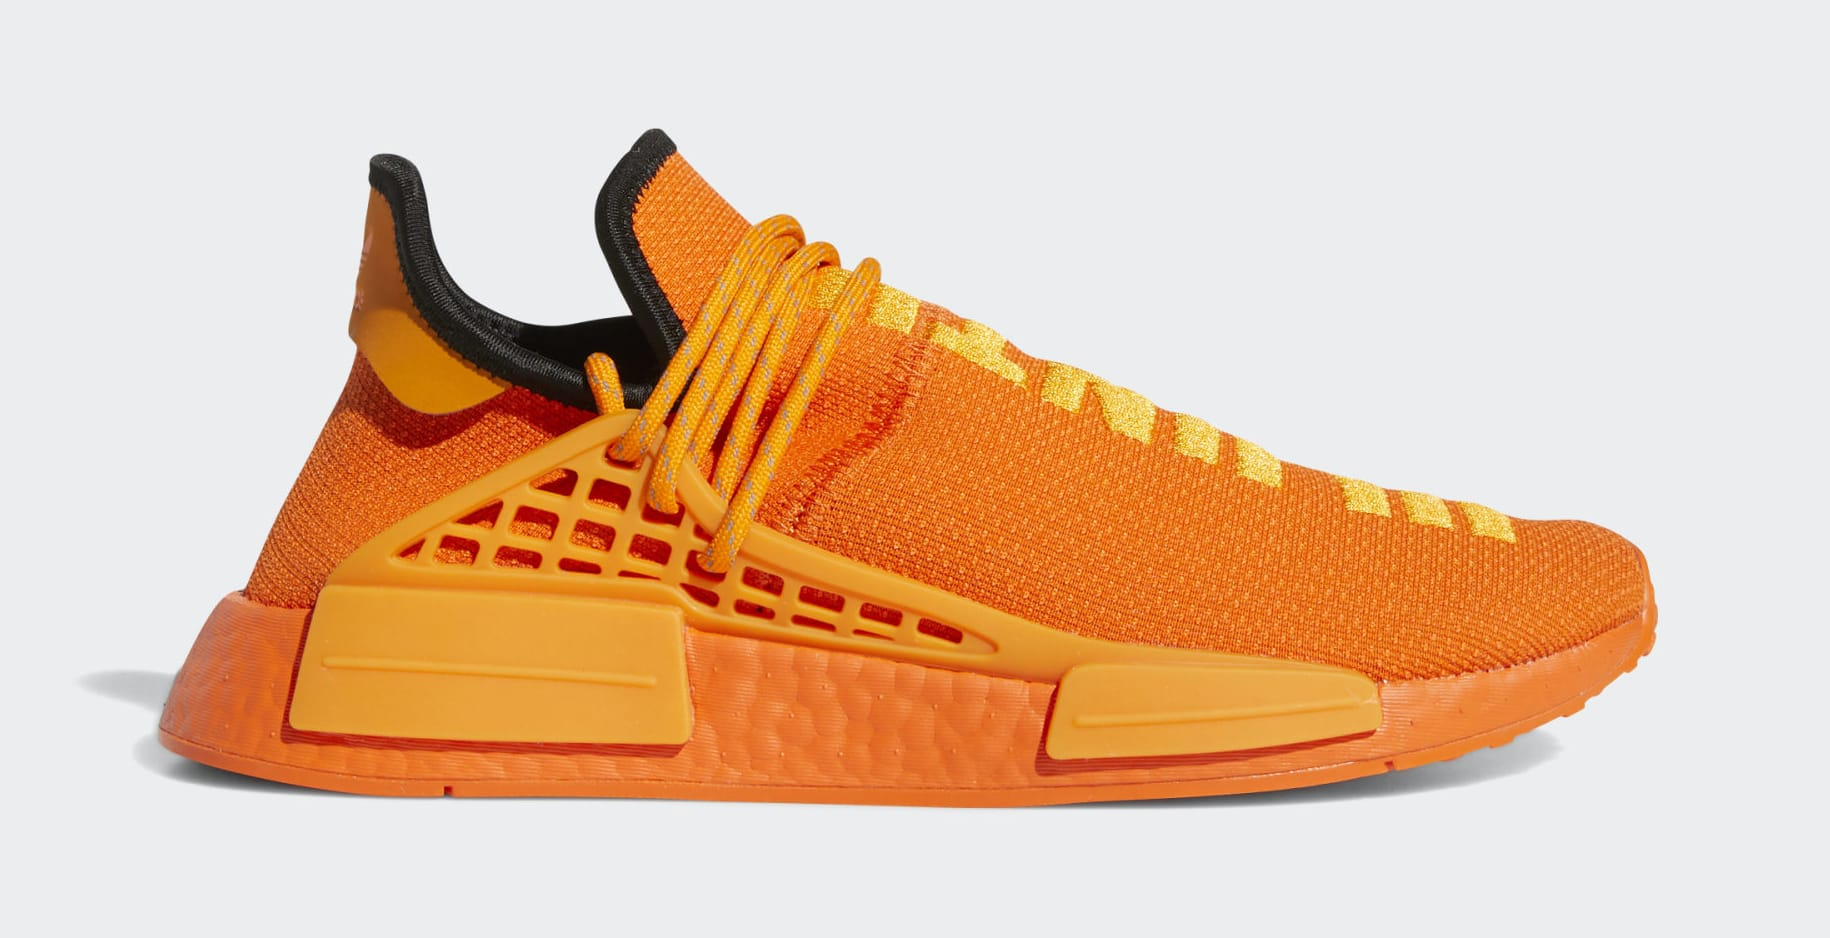 Pharrell x Adidas NMD Hu Orange GY0095 Lateral